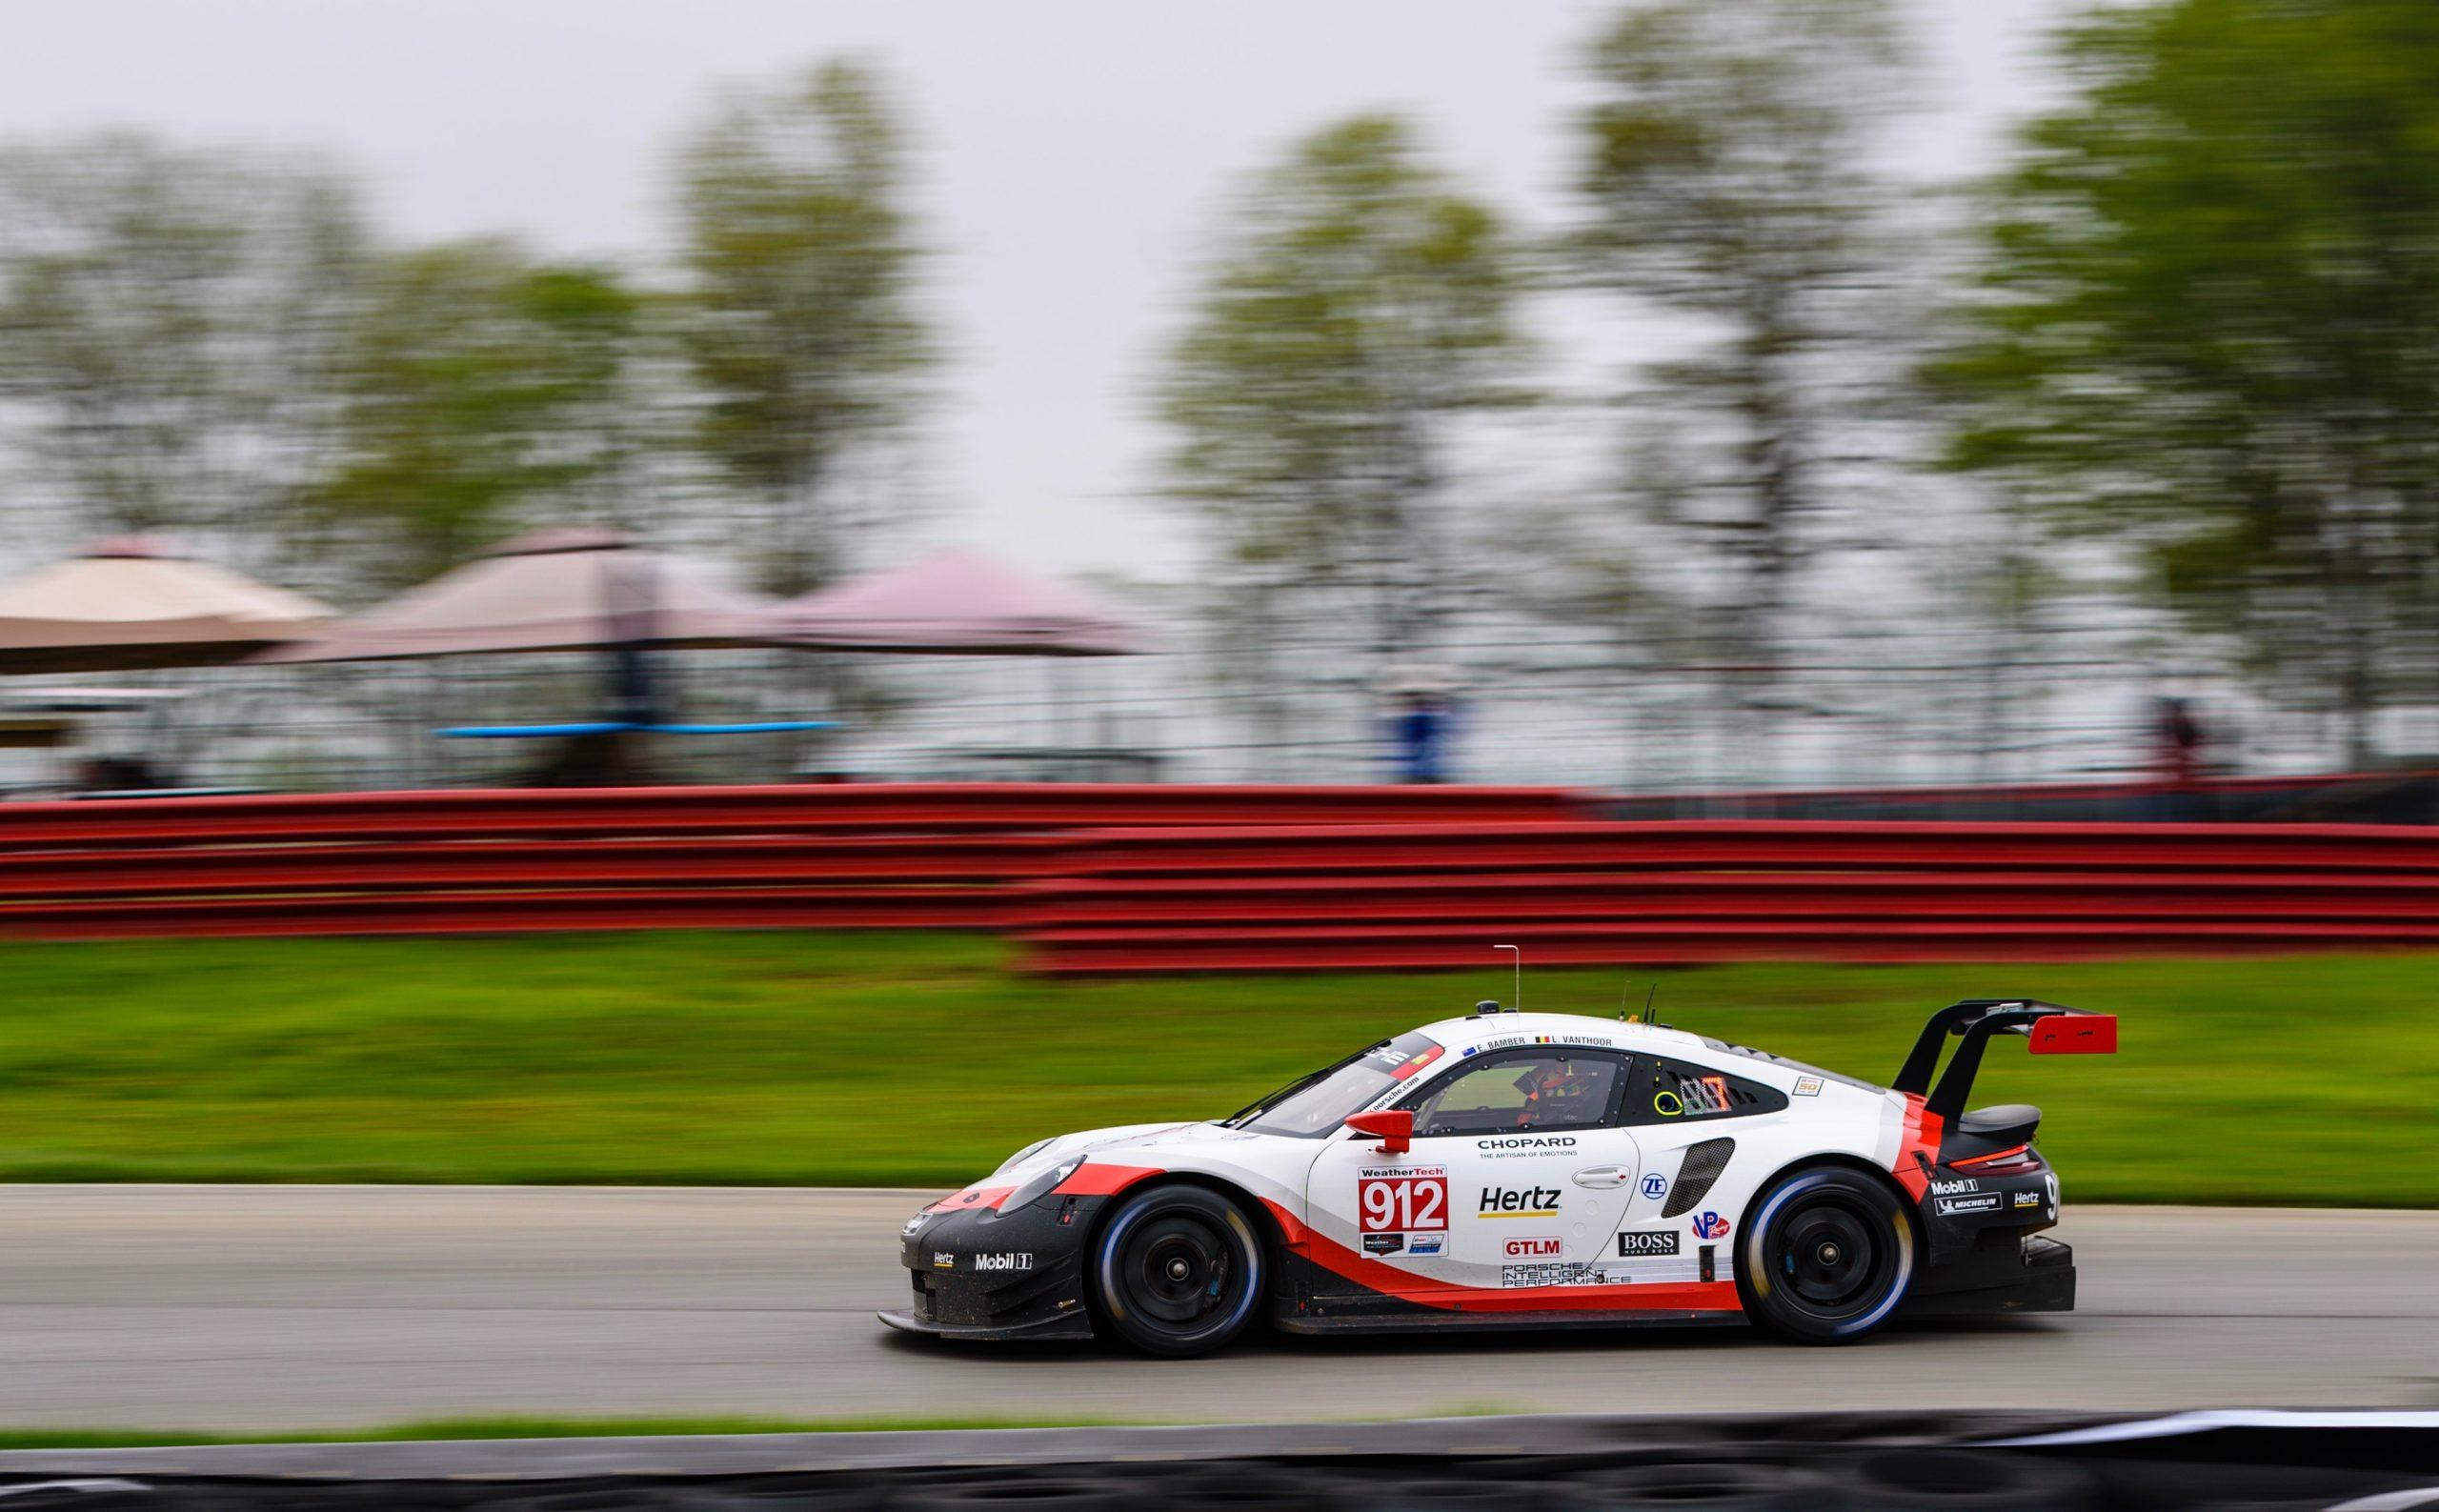 Porsche 911 RSR Mid Ohio Side Profile Action